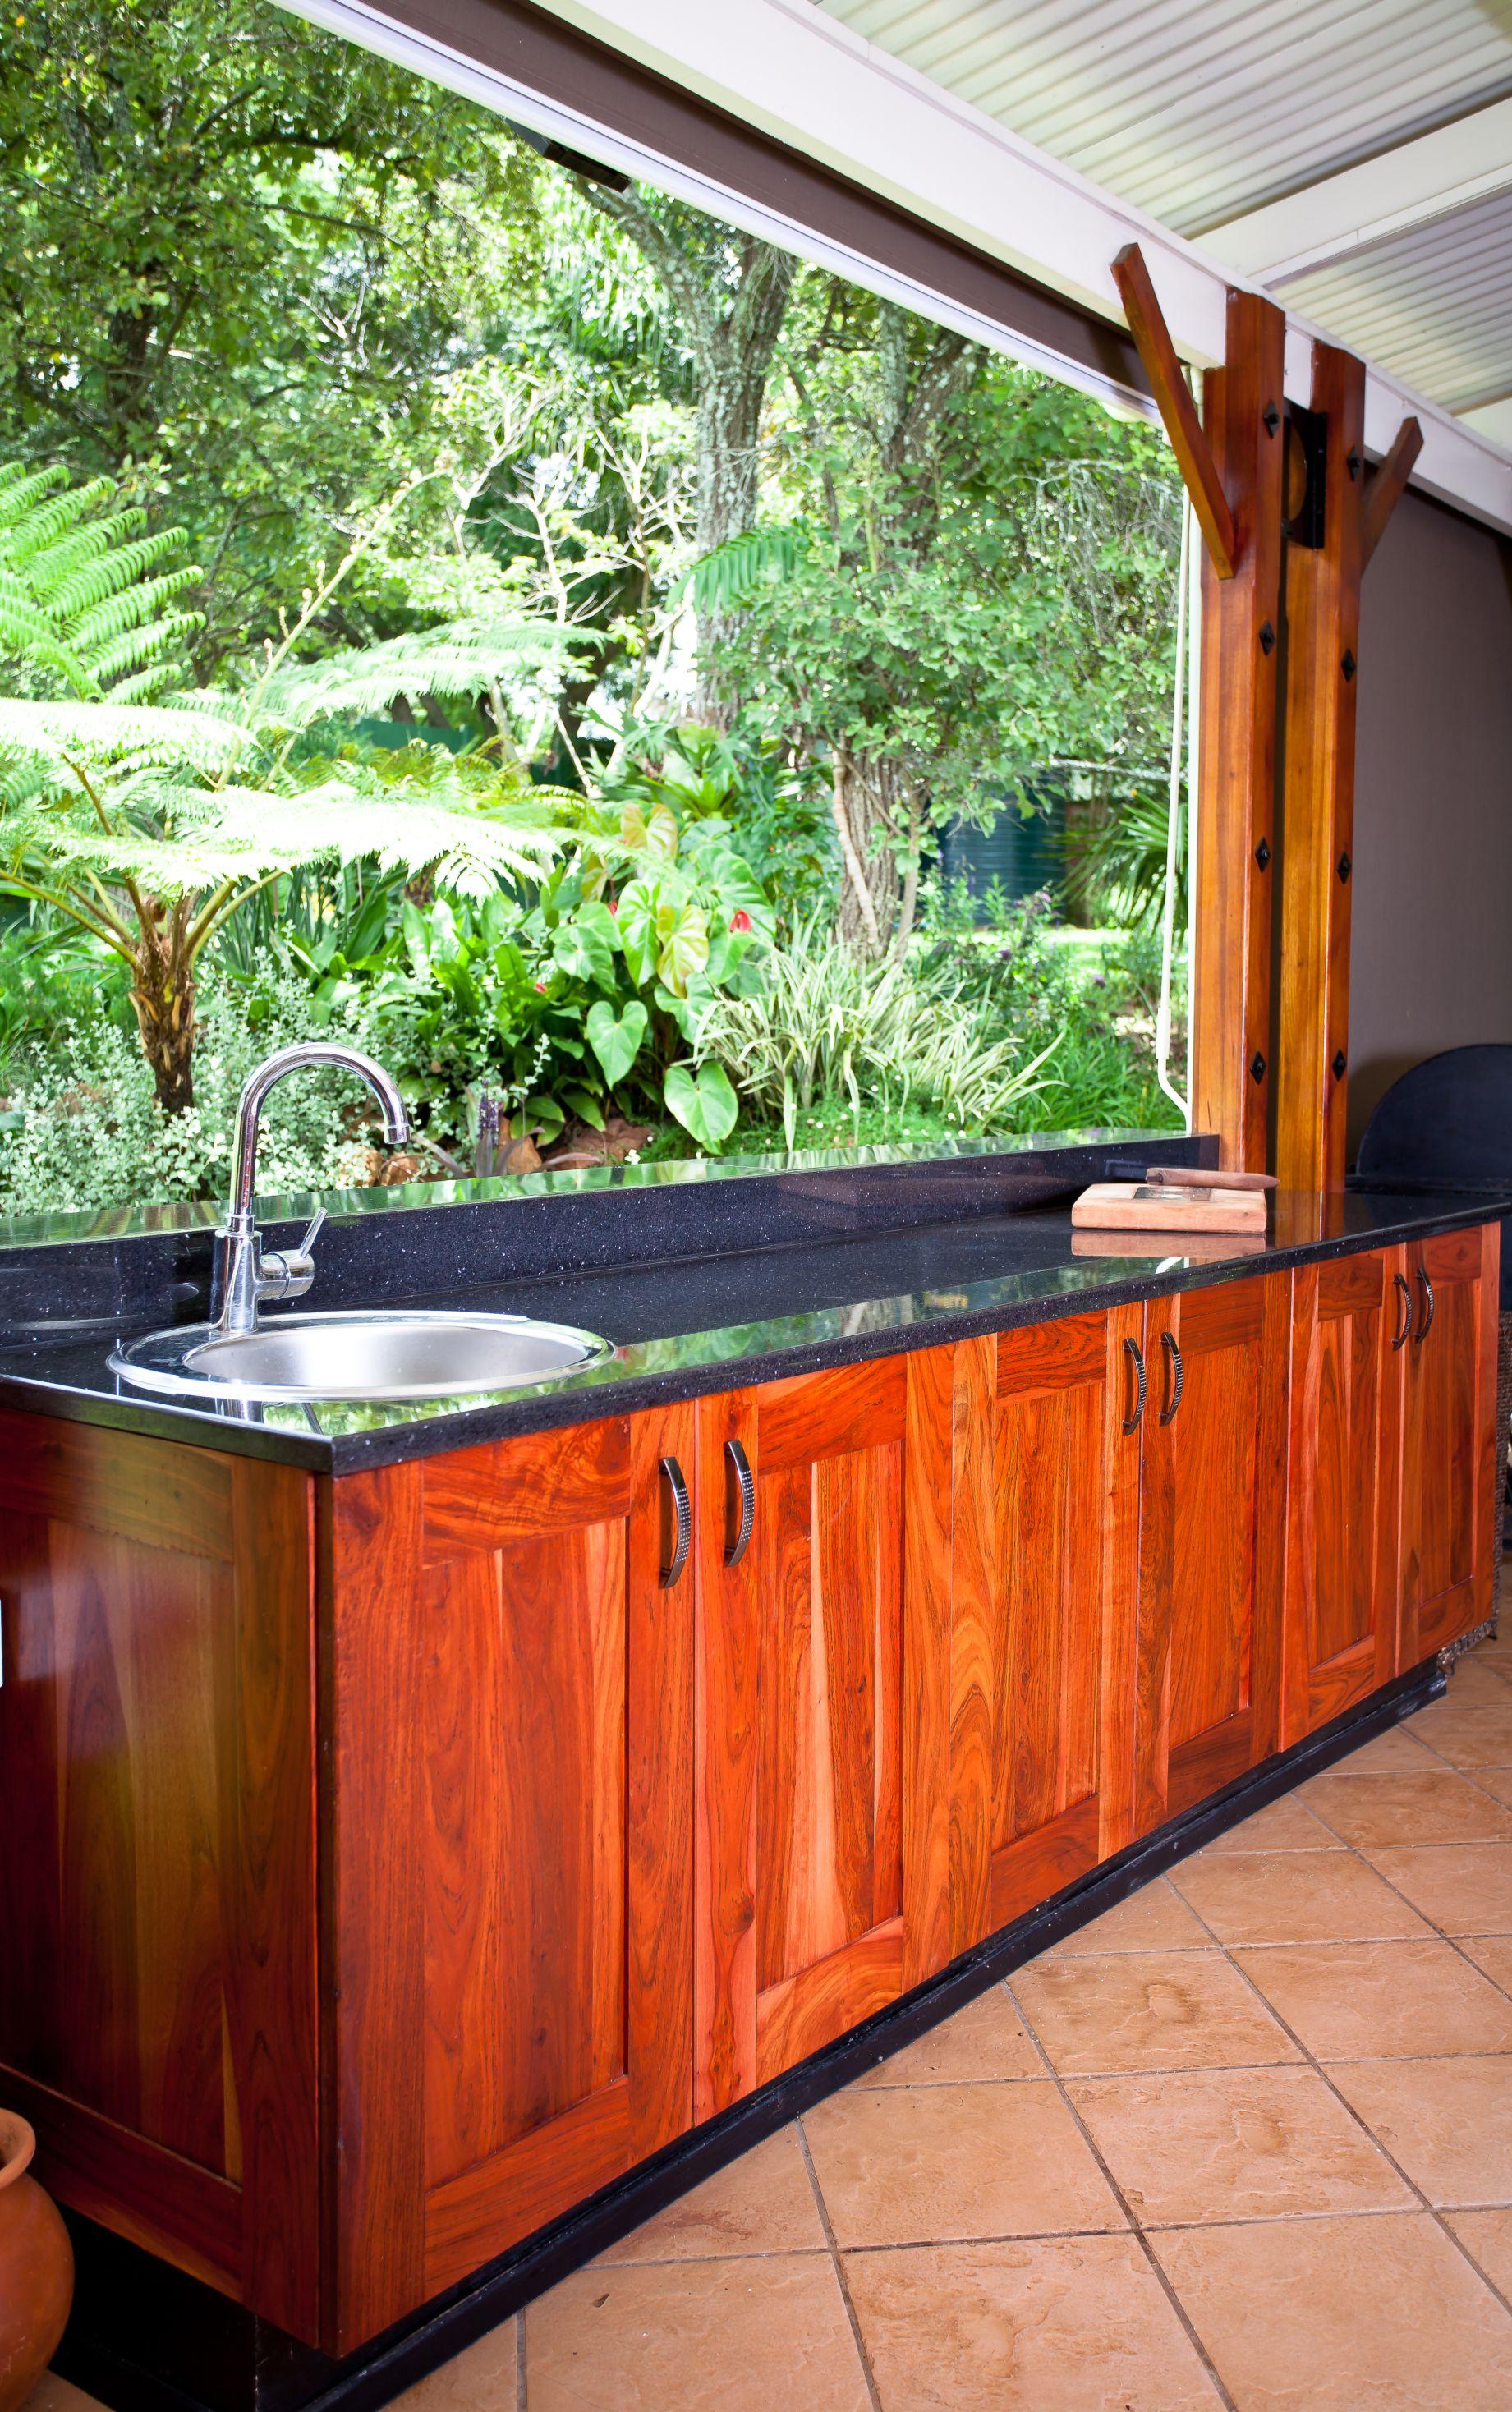 Natural Zimbabwean Teak Shaker Outdoor Bar unit with local Zimbabwean stargate granite counter tops